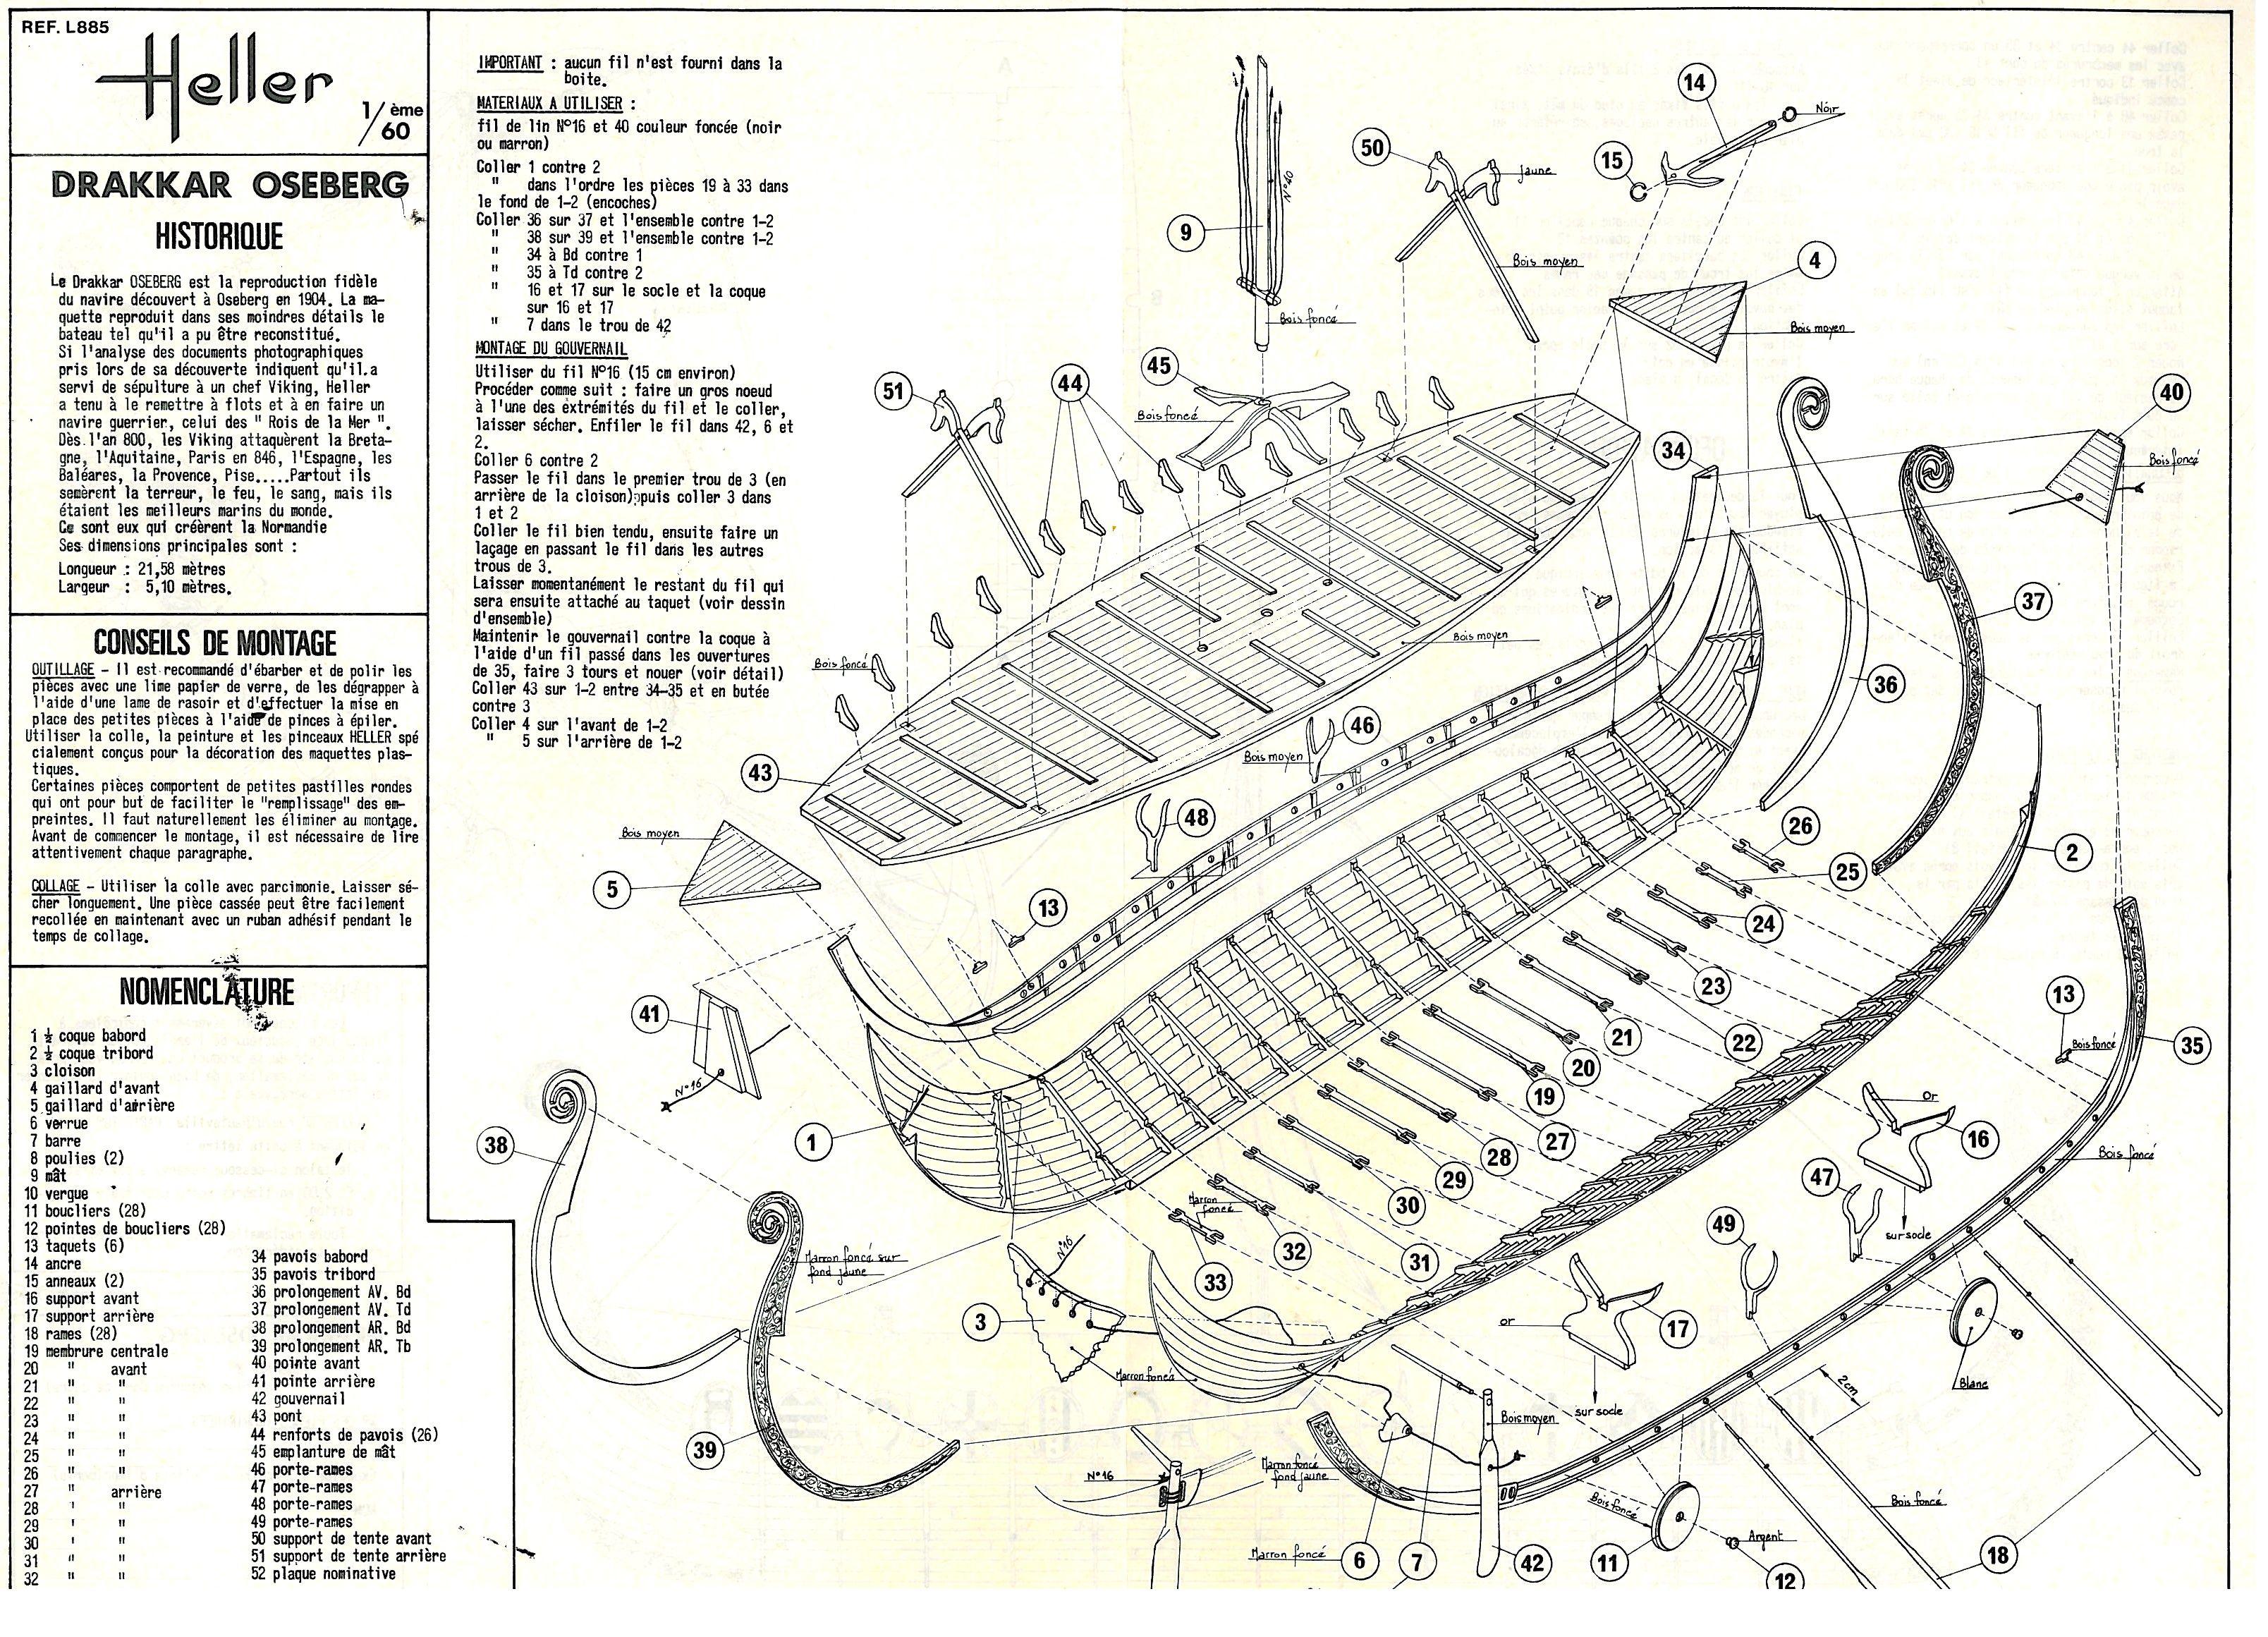 Bauplan eines models des osebergschiff sweden for Costruttore blueprint gratuito